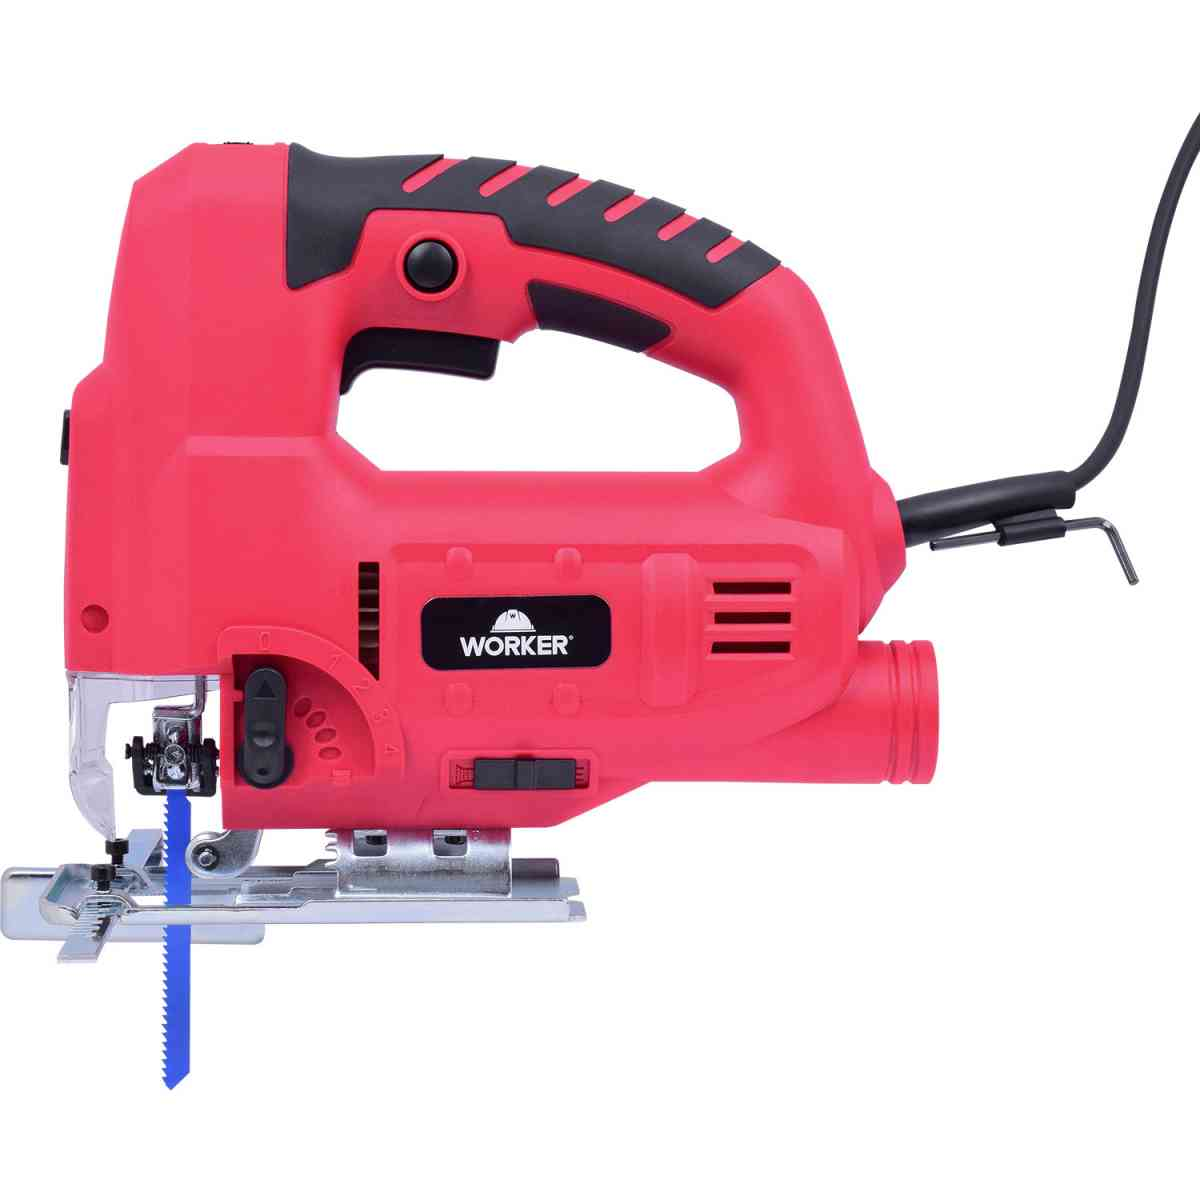 Serra Tico Tico 800W Worker - 220V